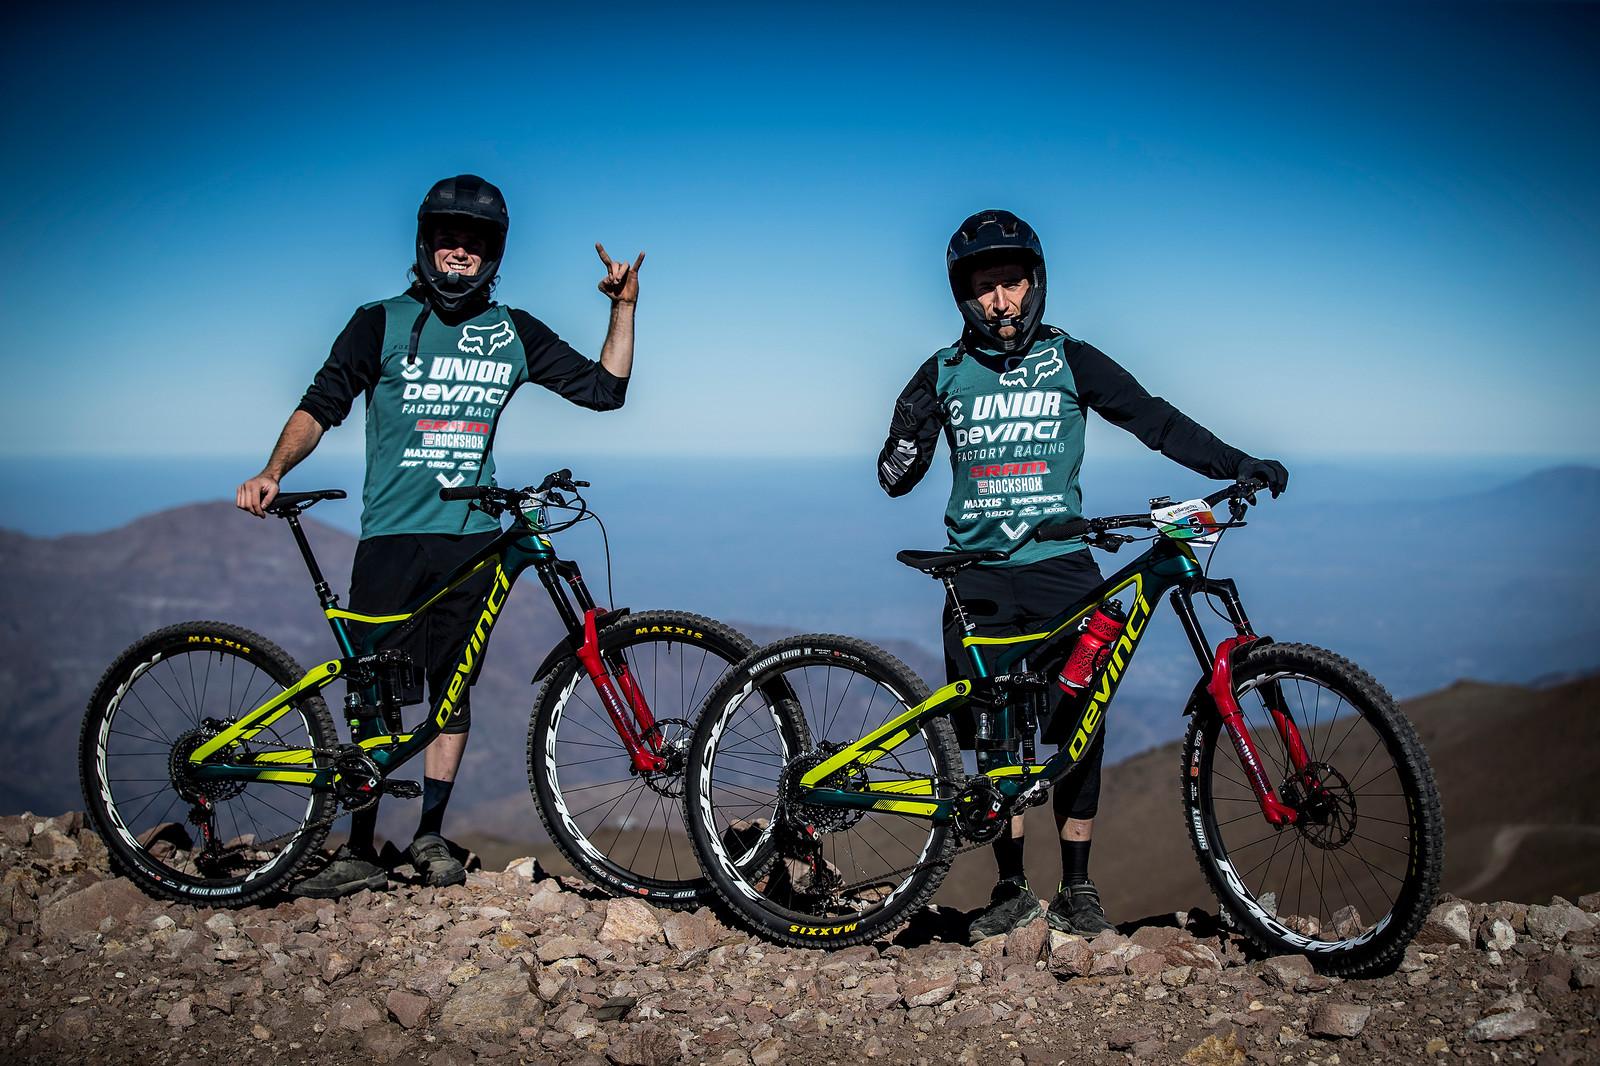 Damien Oton and Keegan Wright at the 2018 La Parva EWS  - PIT BITS AND BIKES - Enduro World Series, Chile - Mountain Biking Pictures - Vital MTB